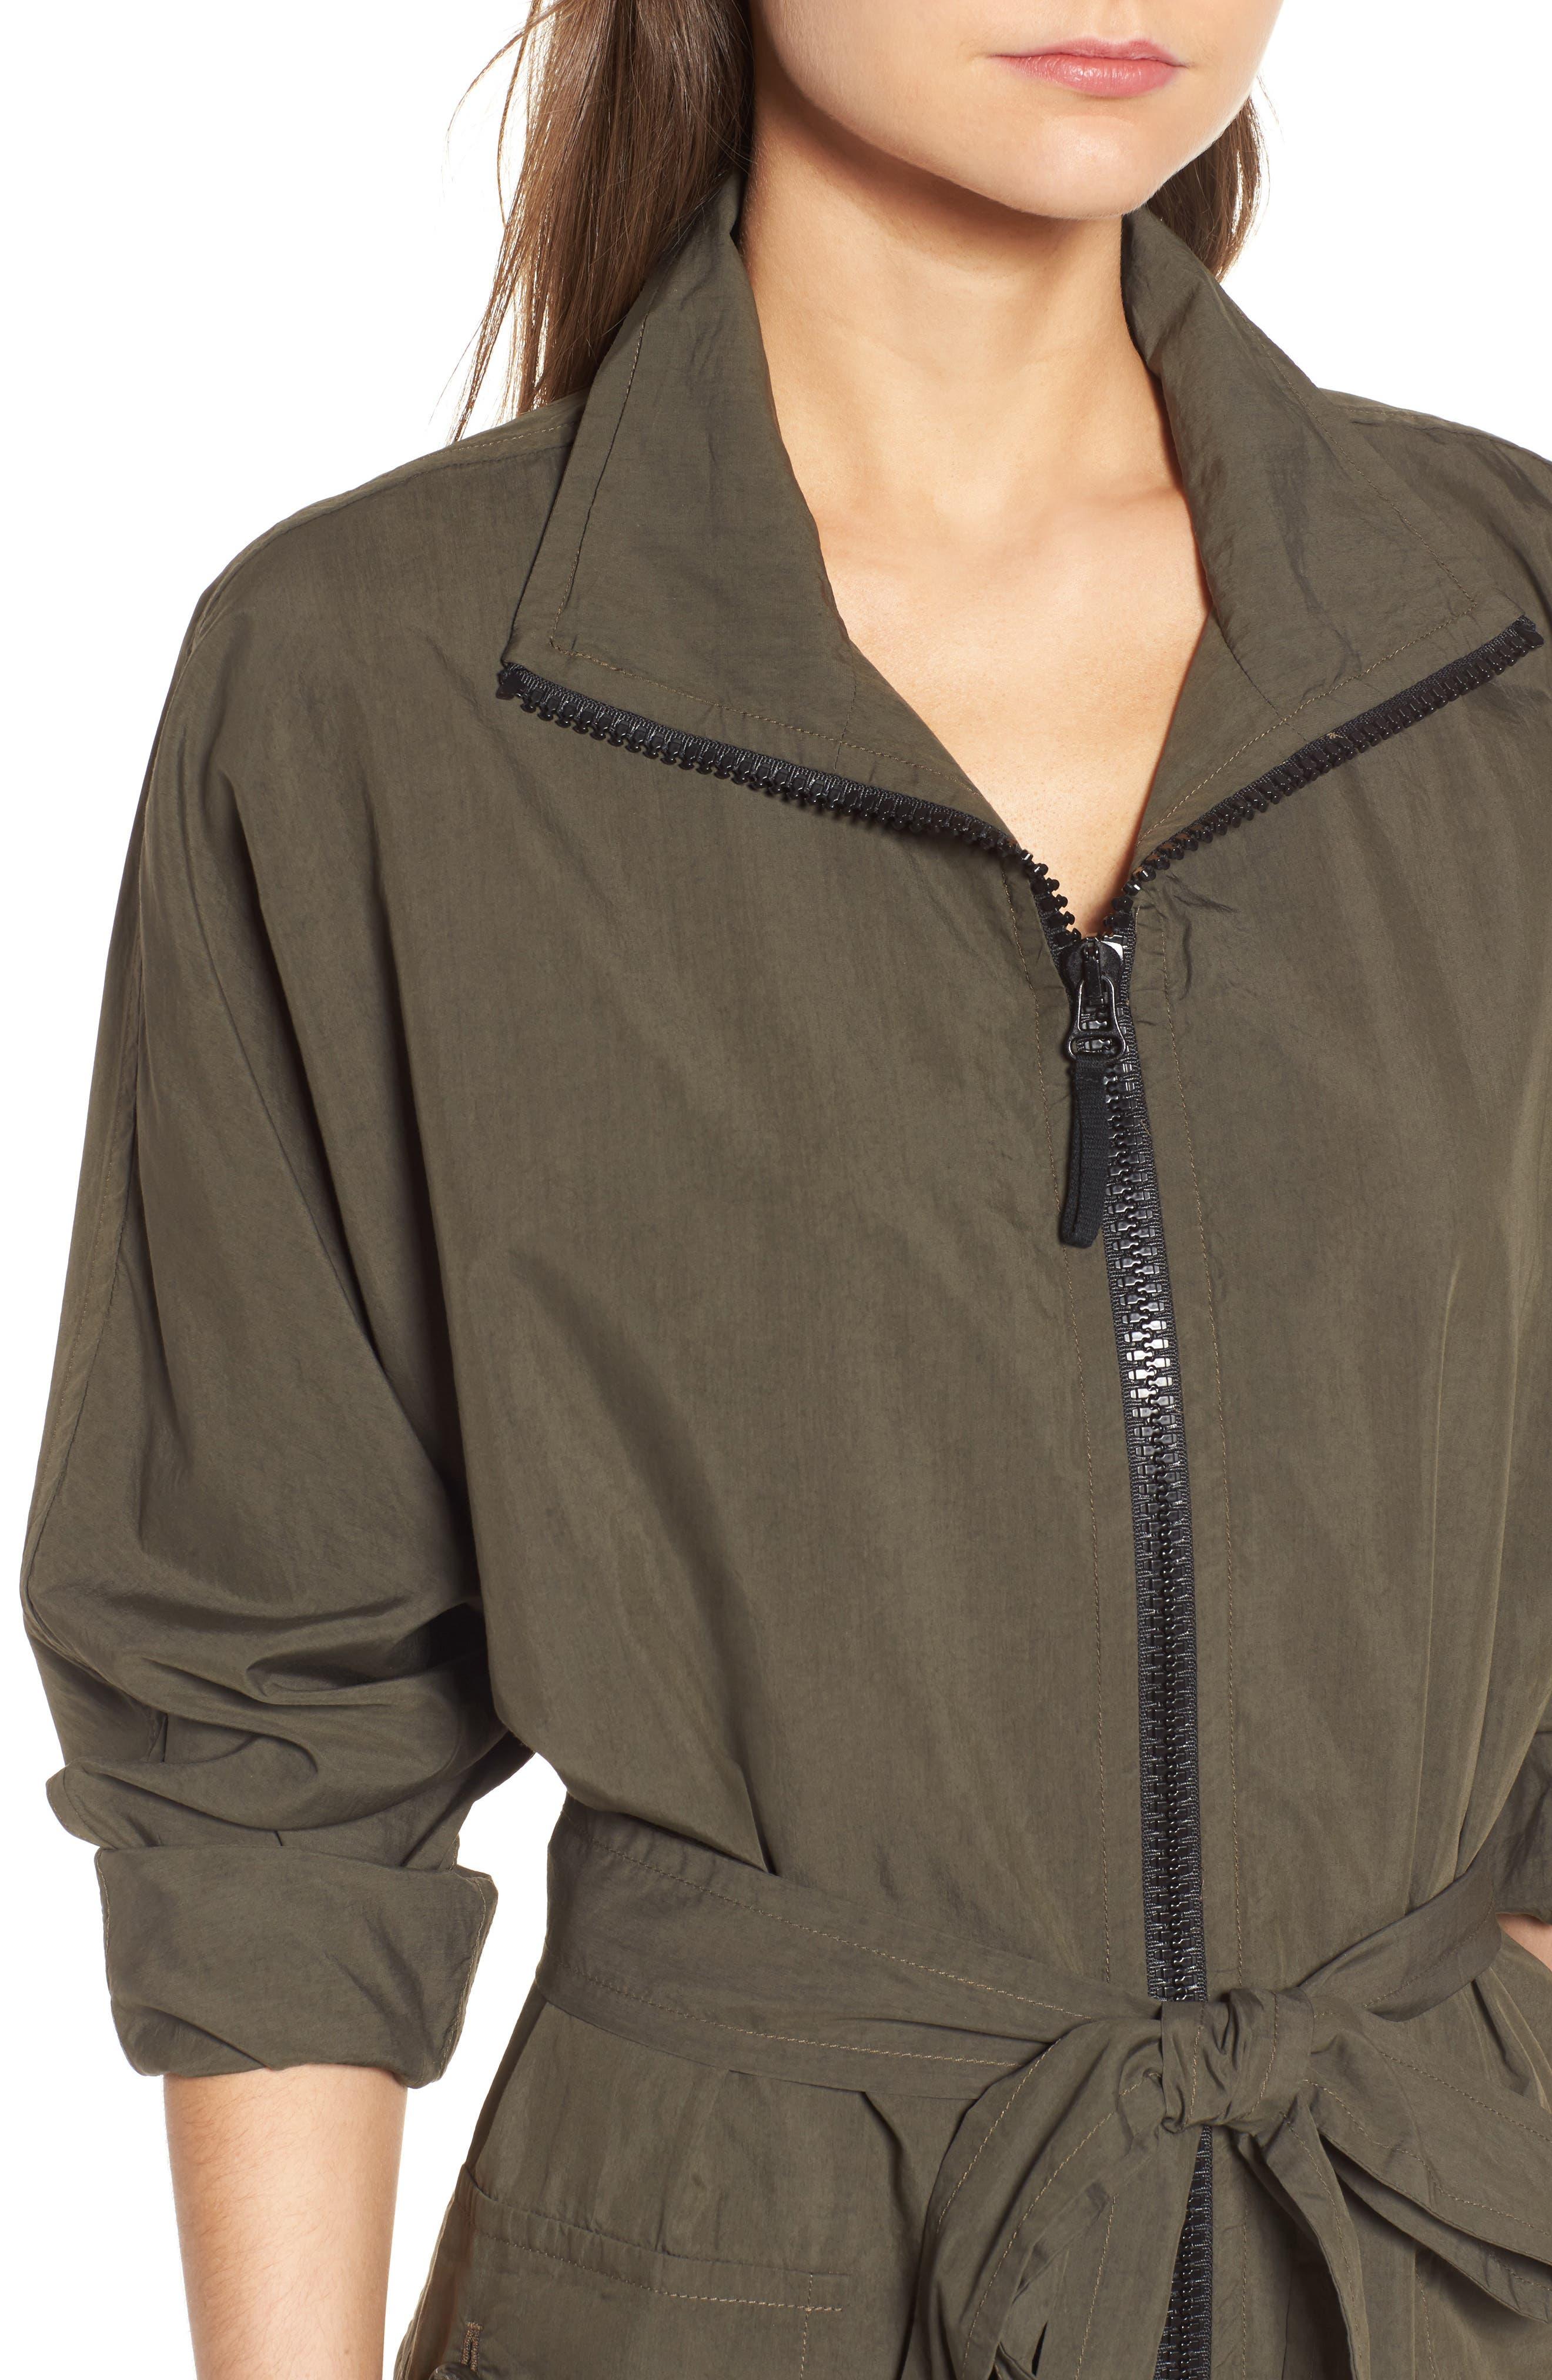 Alternate Image 4  - James Perse Zip Front Jacket Dress